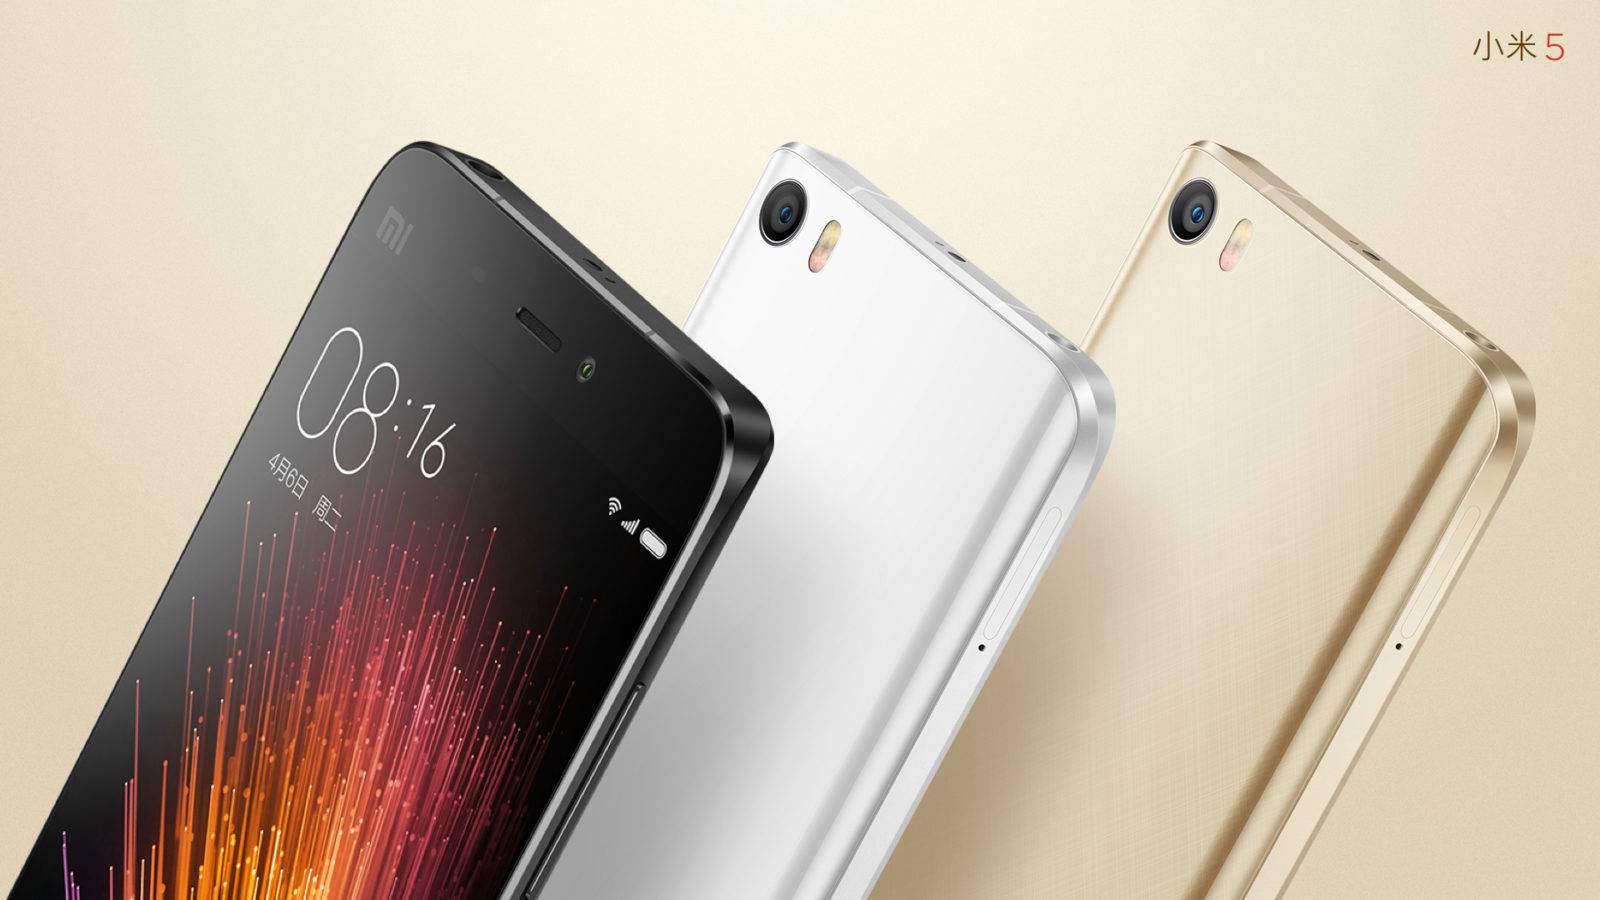 Xiaomi Mi 5 official image_1